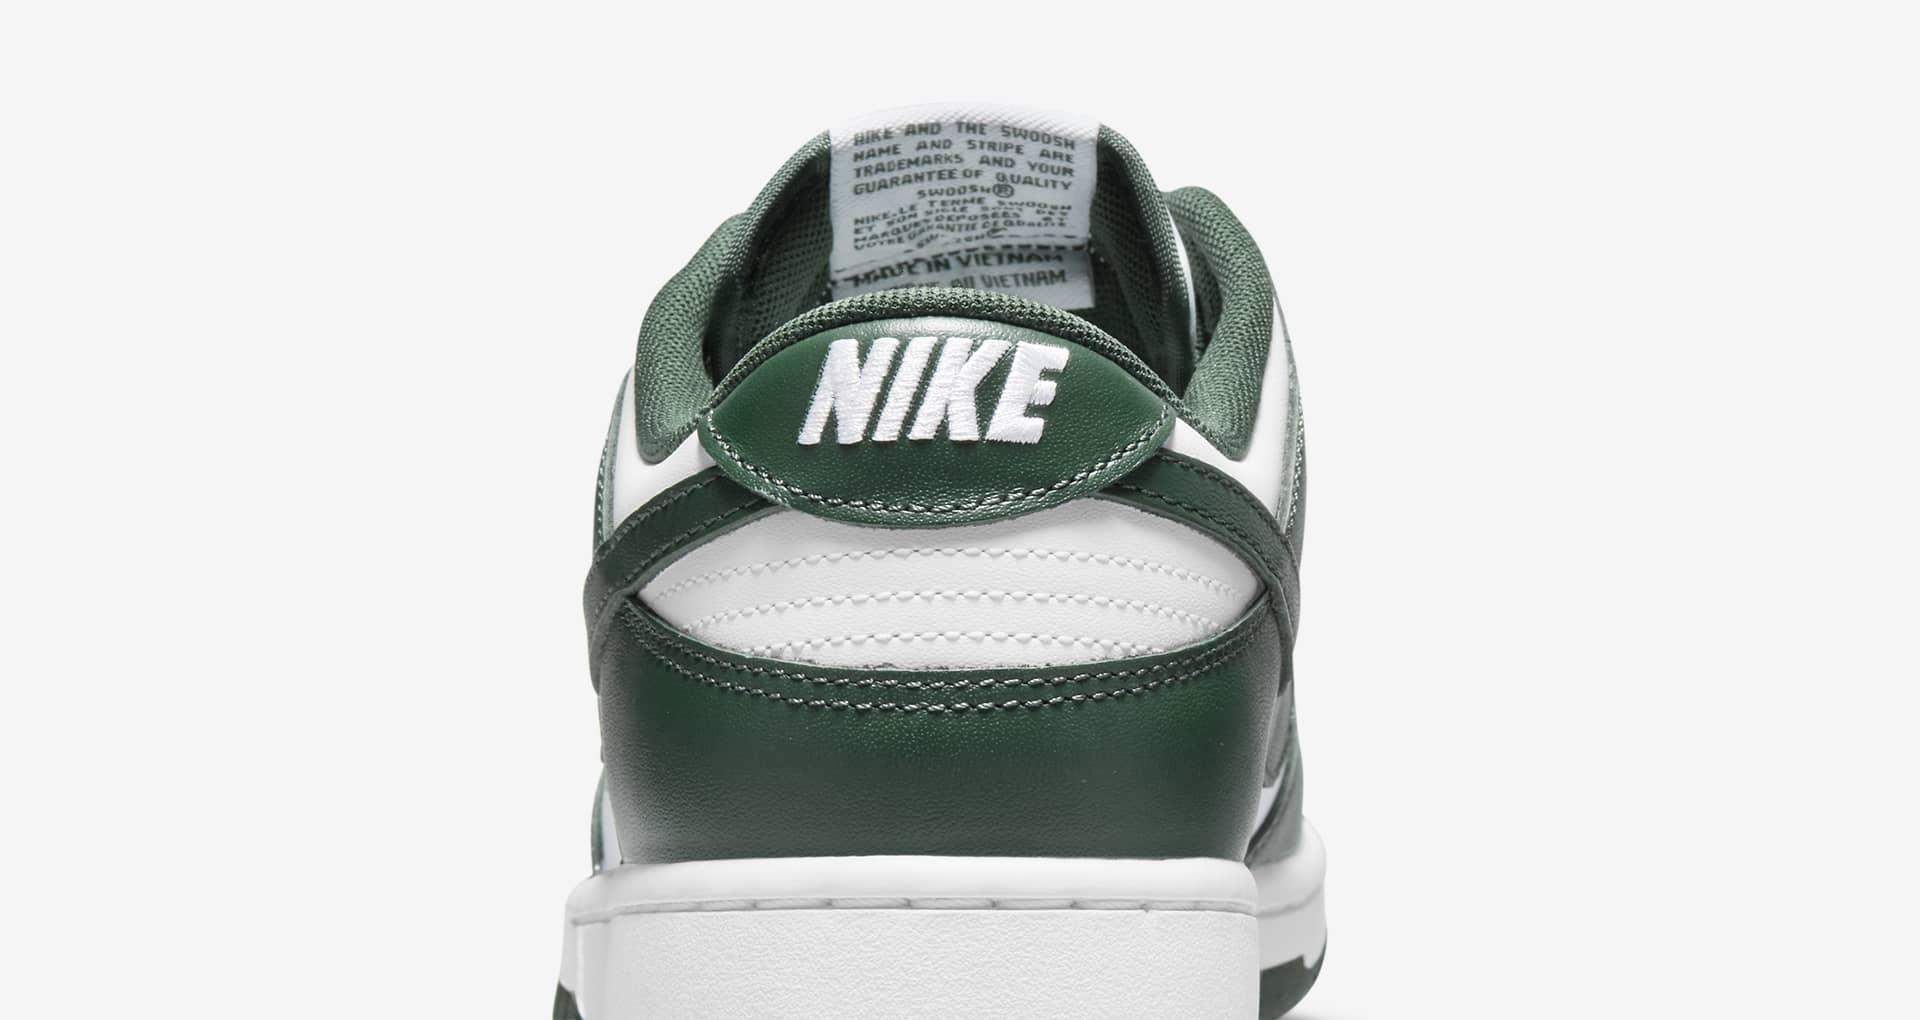 Nike,Dunk Low,DD1391-700,DD139  OW x Dunk 绝佳平替!两款全新 Dunk Low 即将发售!